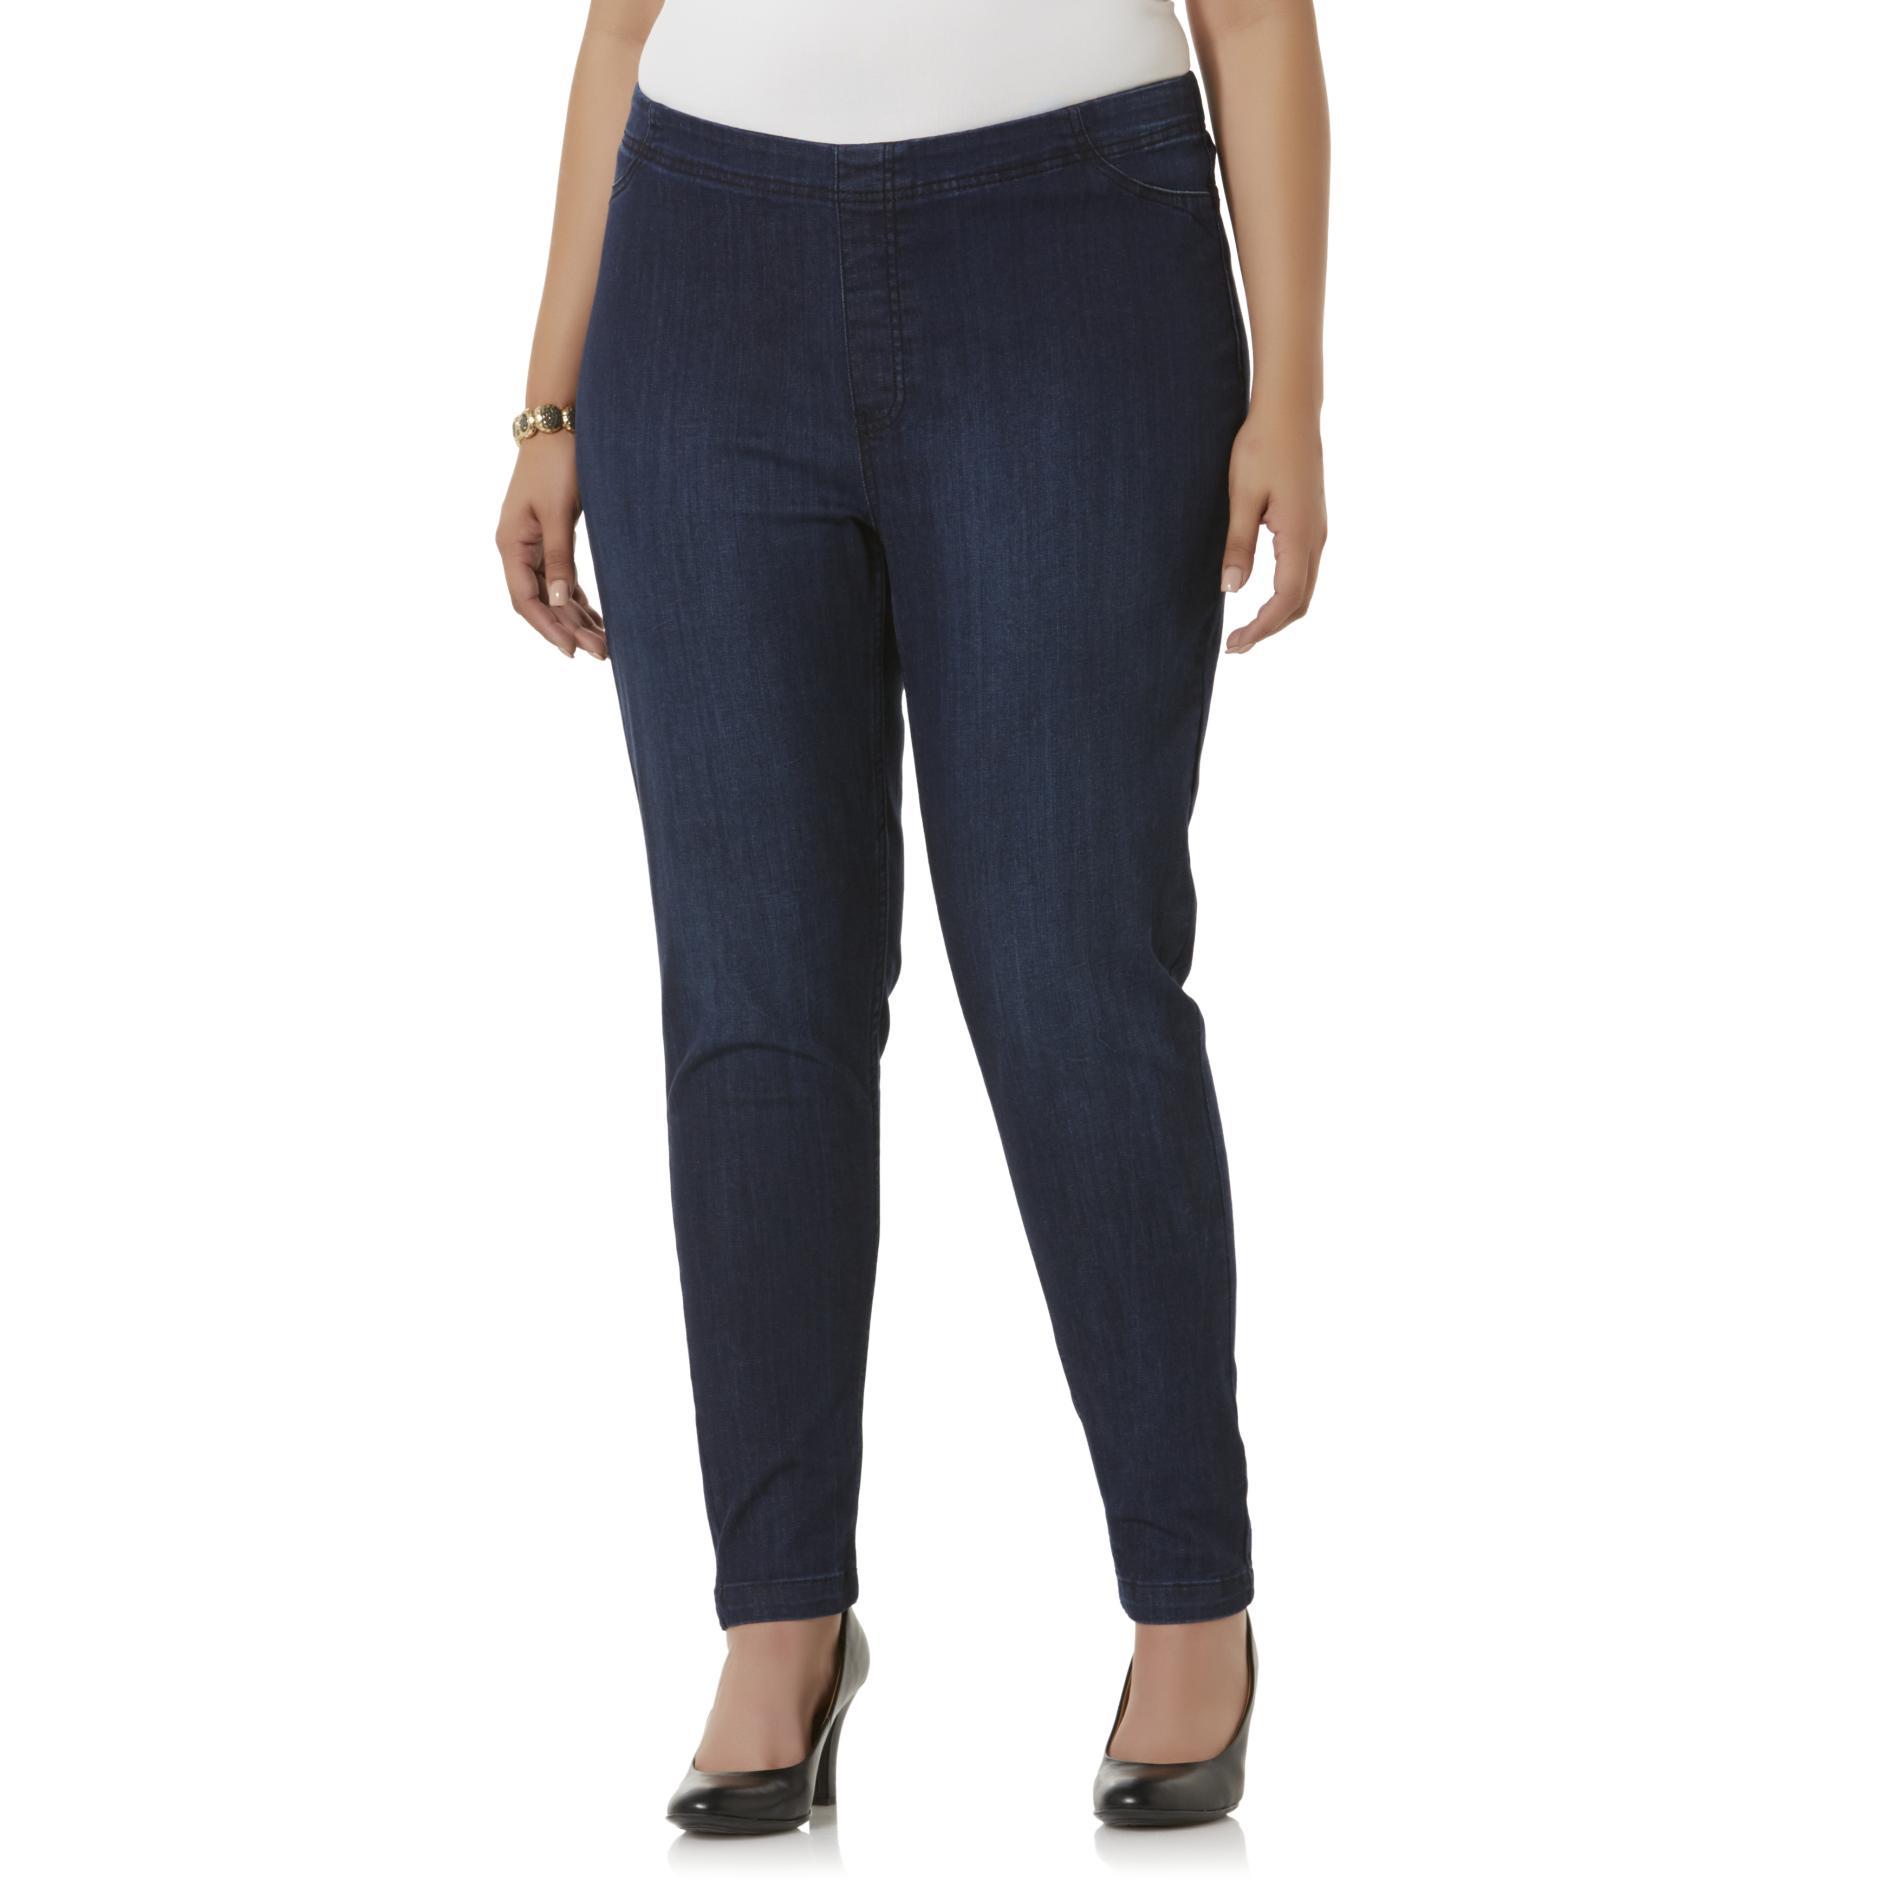 Simply Emma Women's Plus Straight Leg Jeans